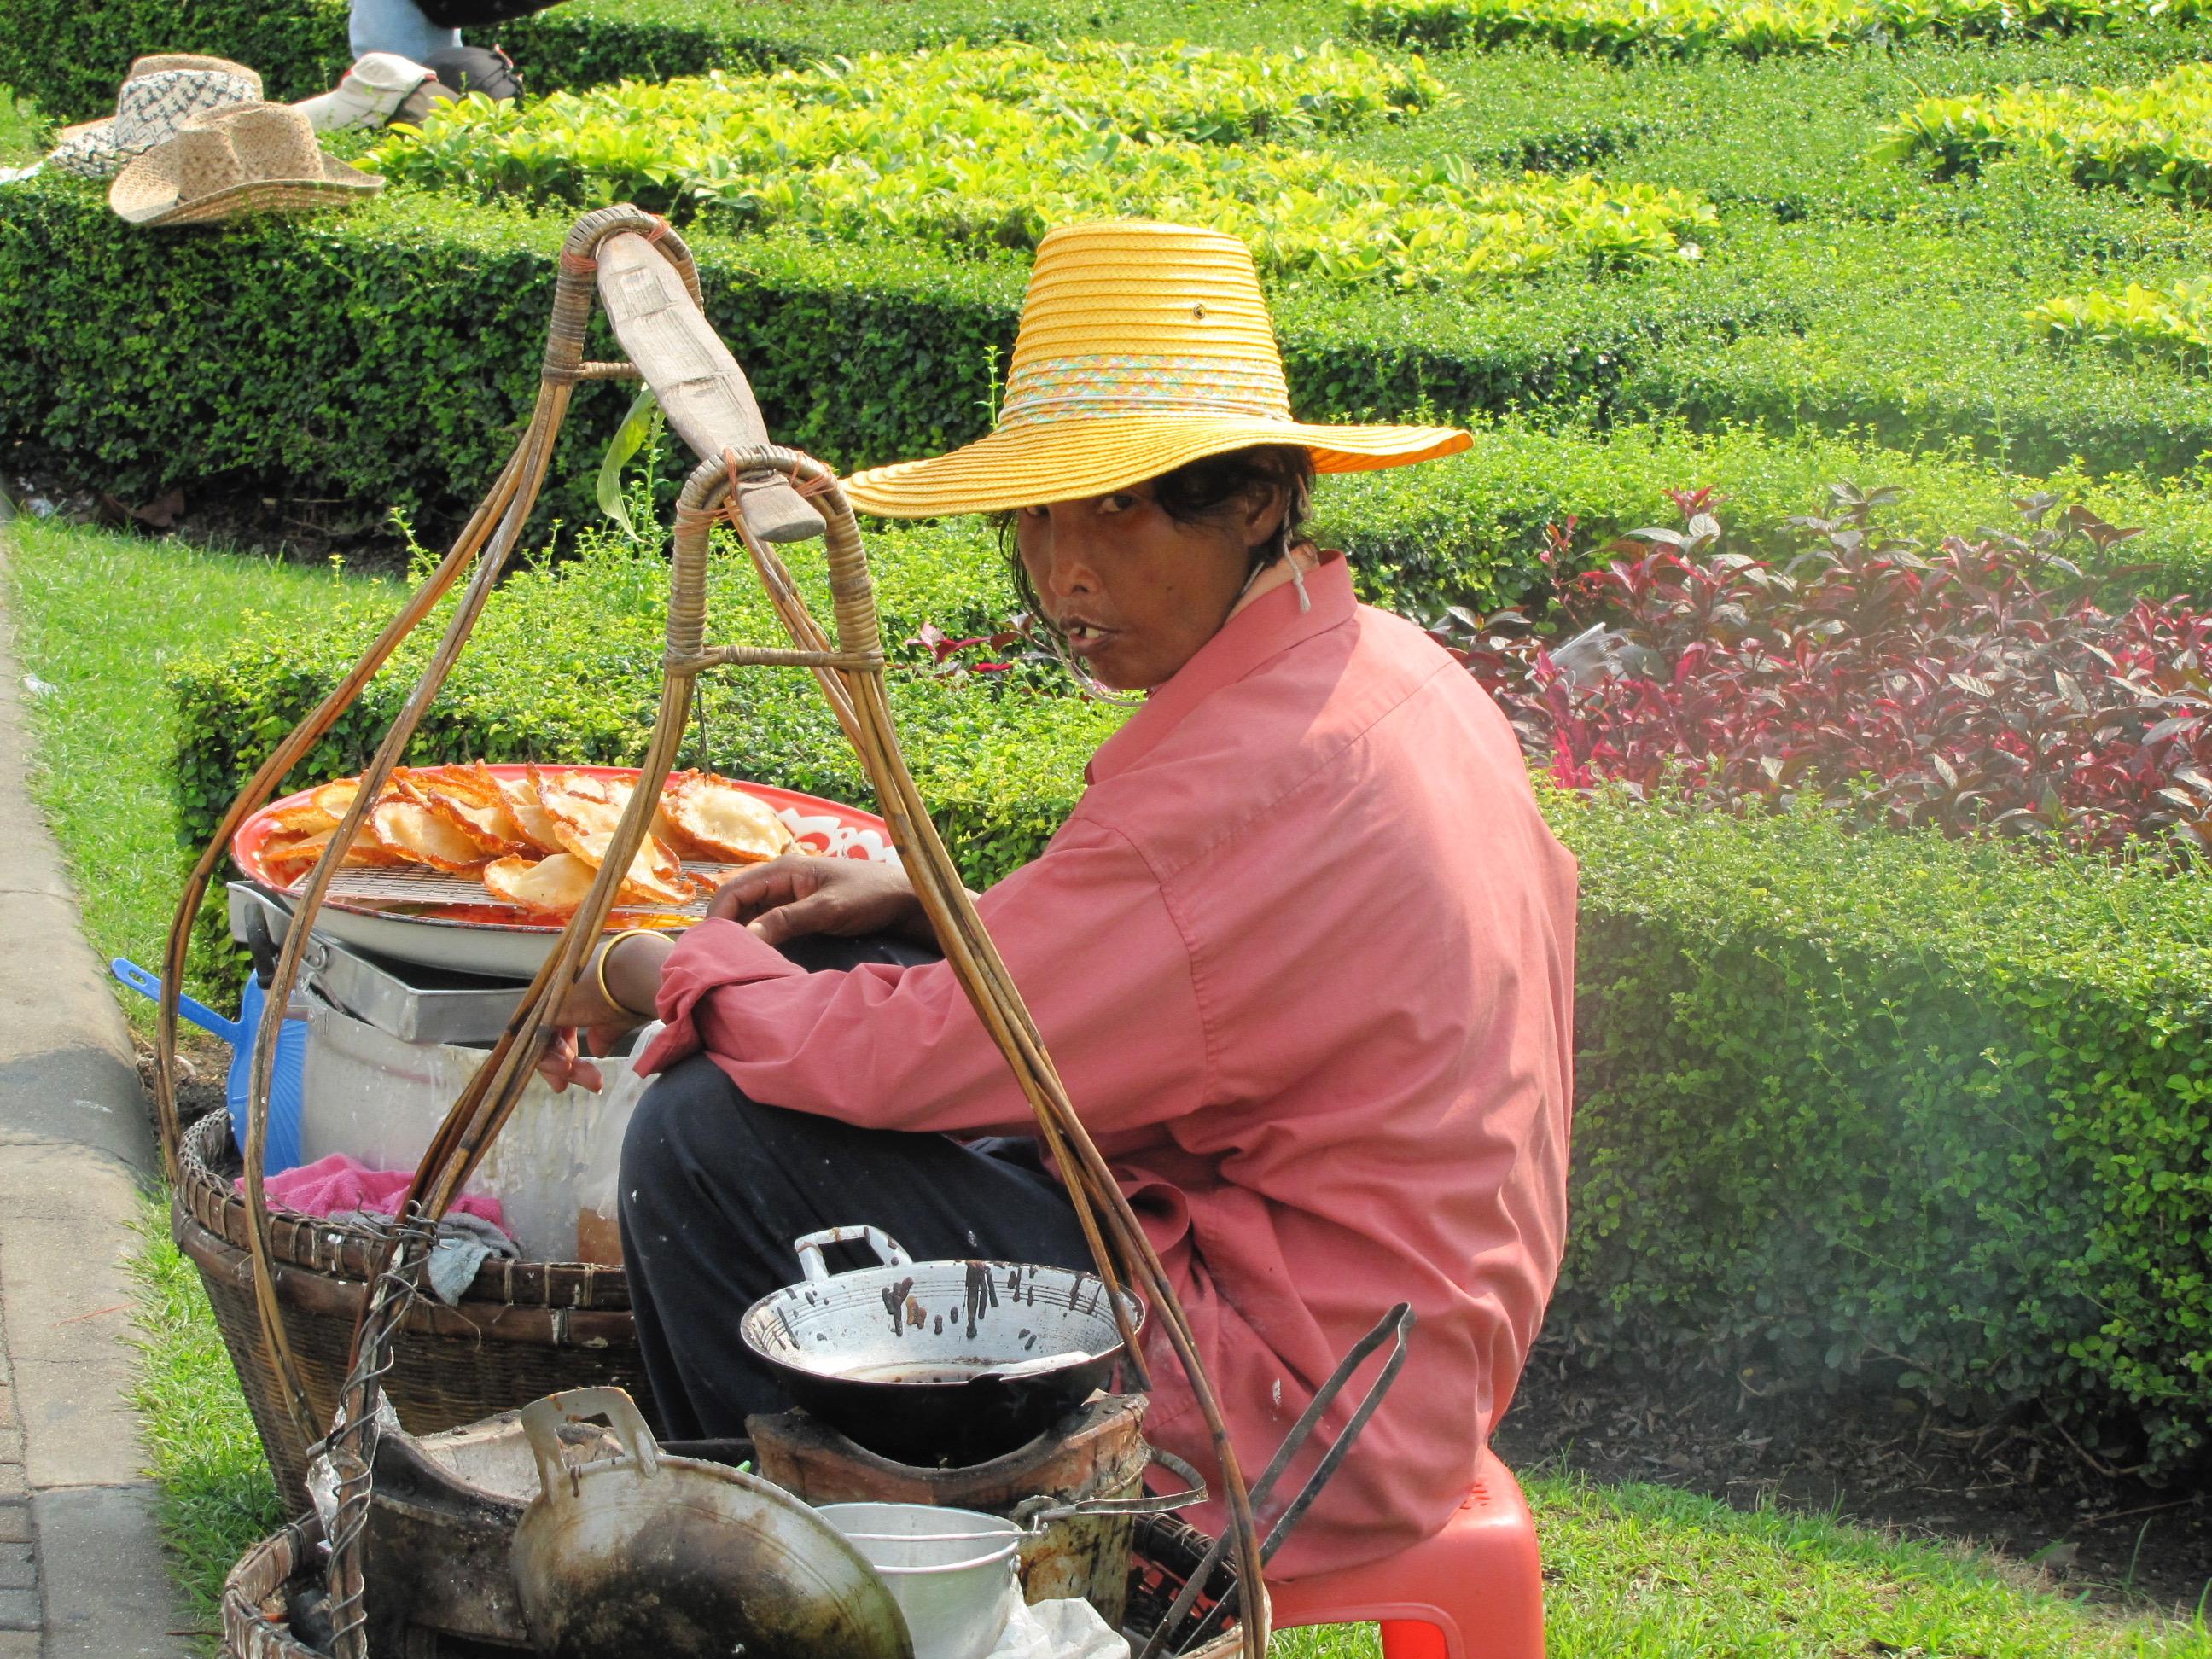 Street Food Vendor, Bangkok